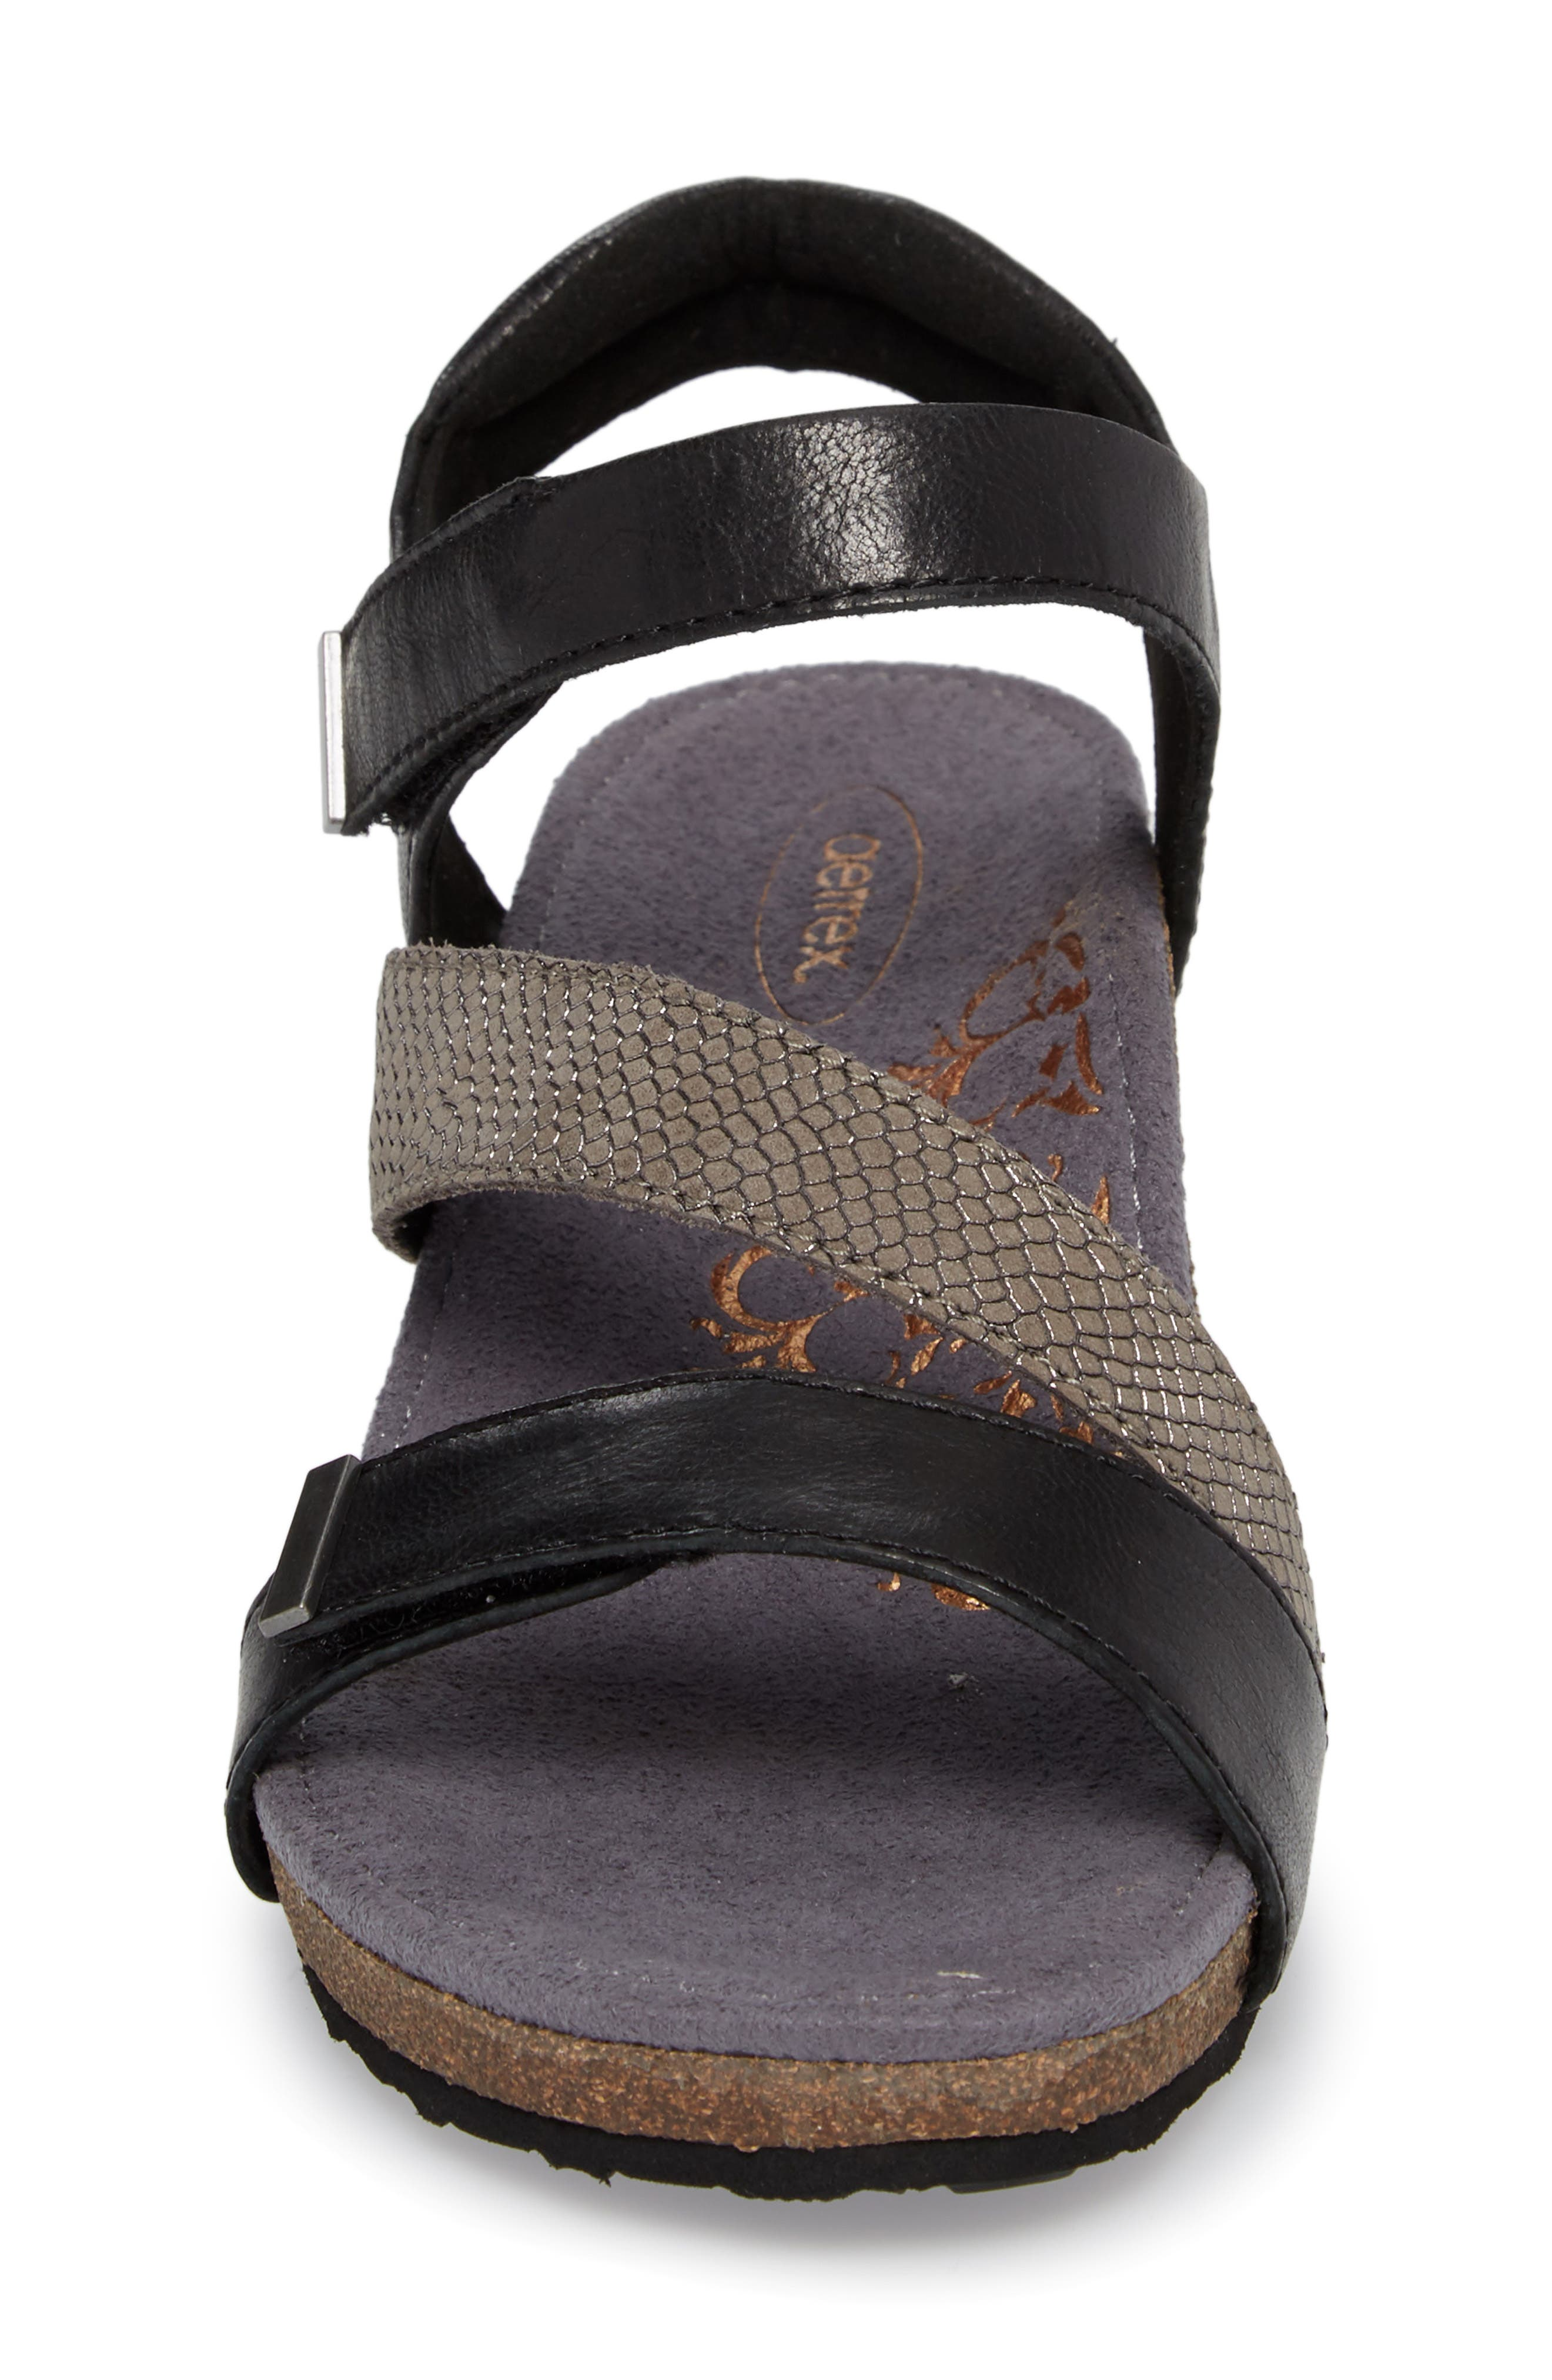 Brynn Asymmetrical Wedge Sandal,                             Alternate thumbnail 4, color,                             Black Leather